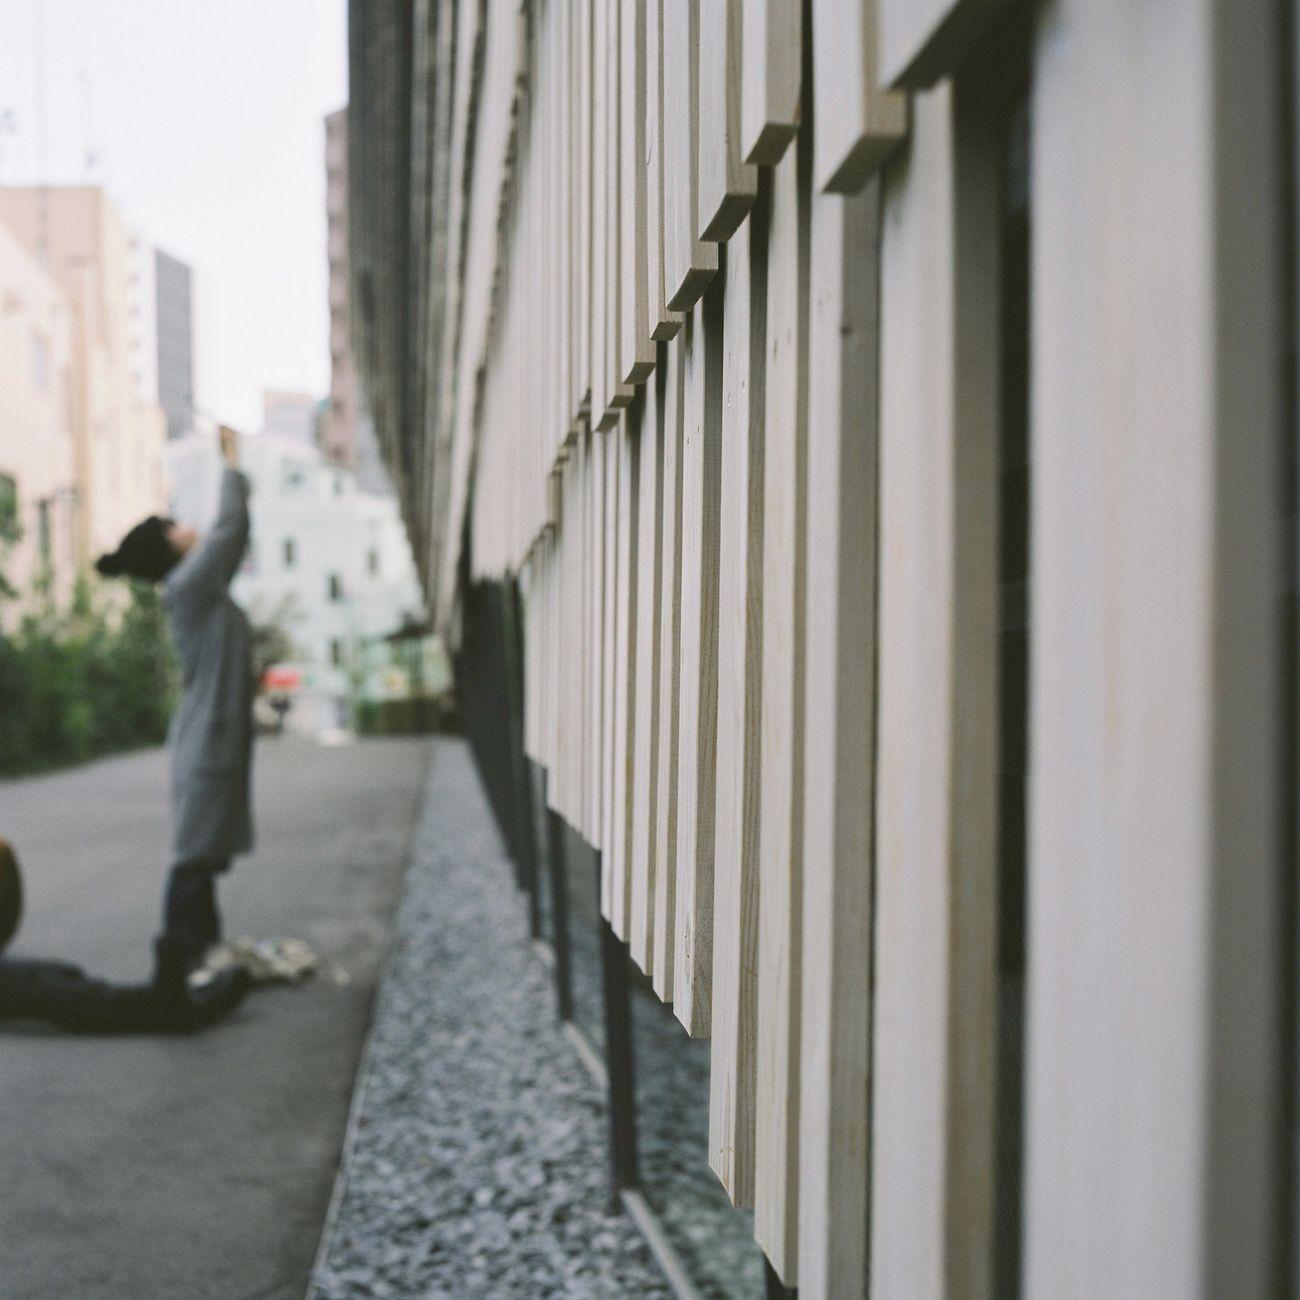 Relaxing Taking Photos Enjoying Life Streetphotography ローライコード Tokyo Film Photography Eyeemphotography EyeEm Best Shots Taking Photos Film